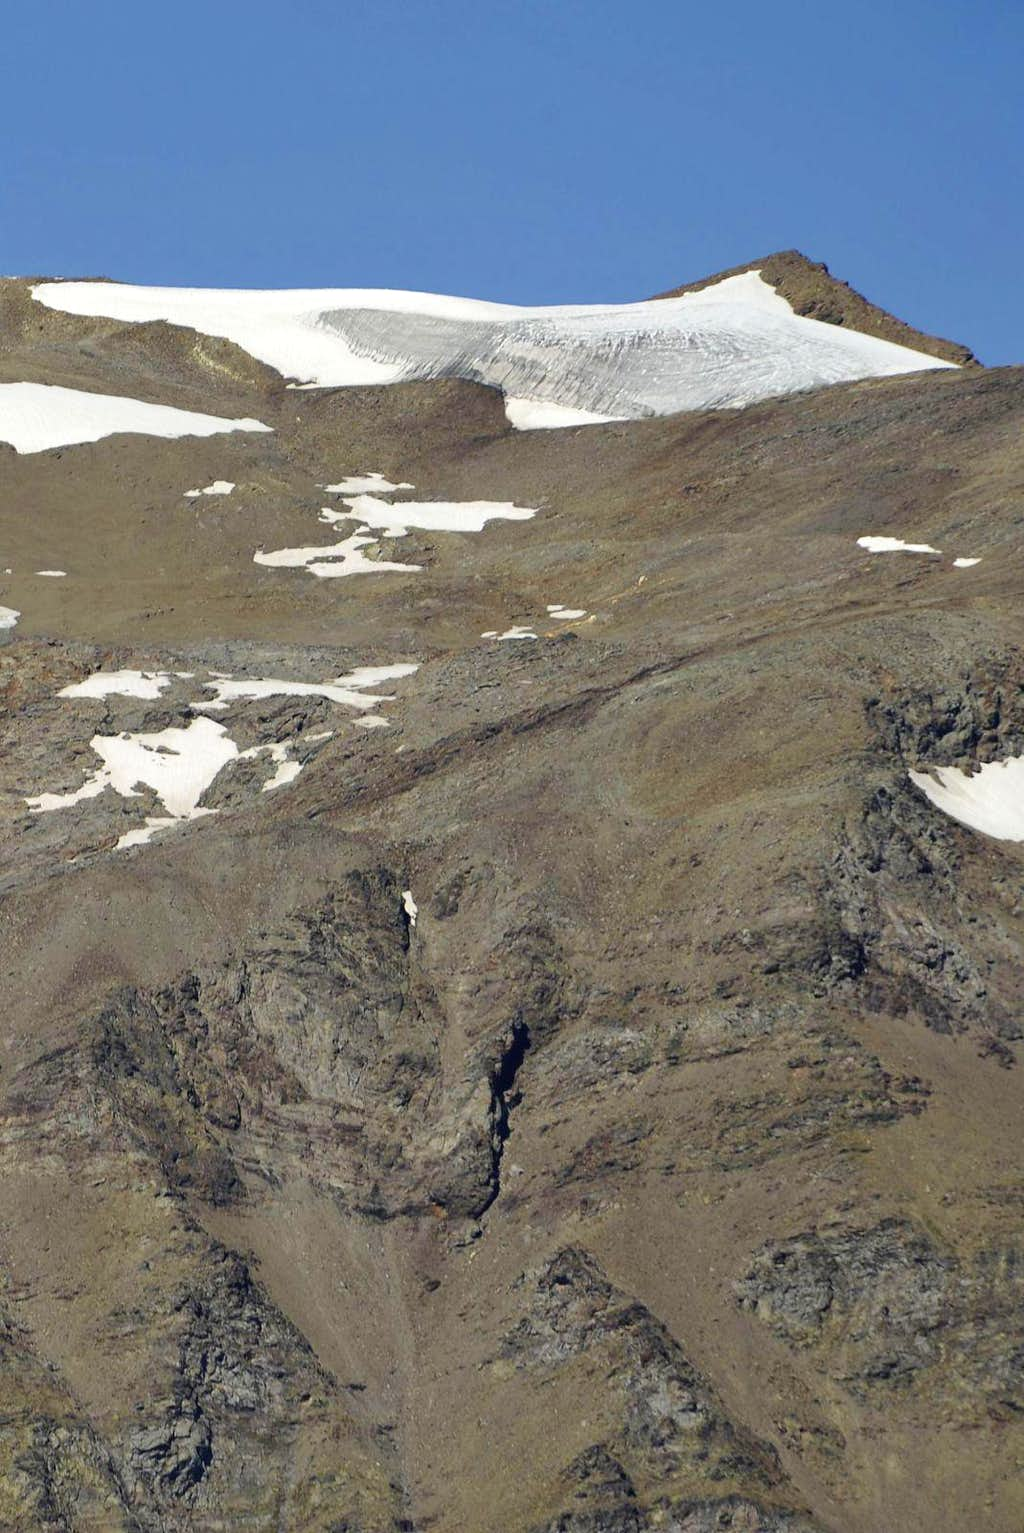 Truc Blanc Glacier